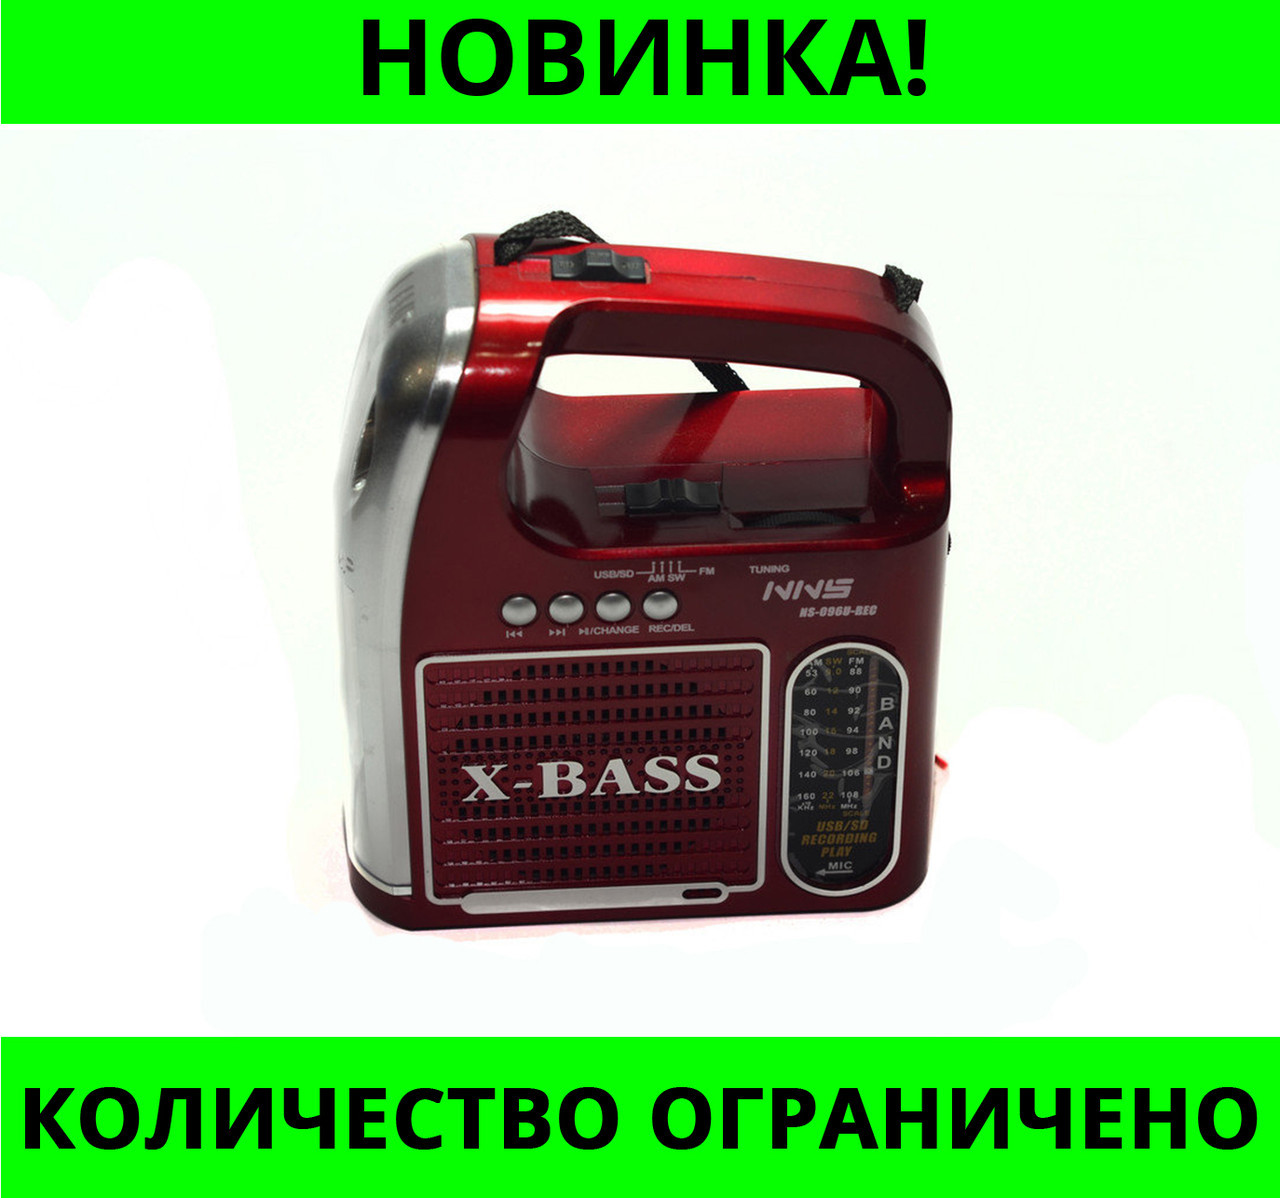 РАДИОПРИЕМНИК С ФОНАРЕМ NS-096U-REC NNS!Розница и Опт